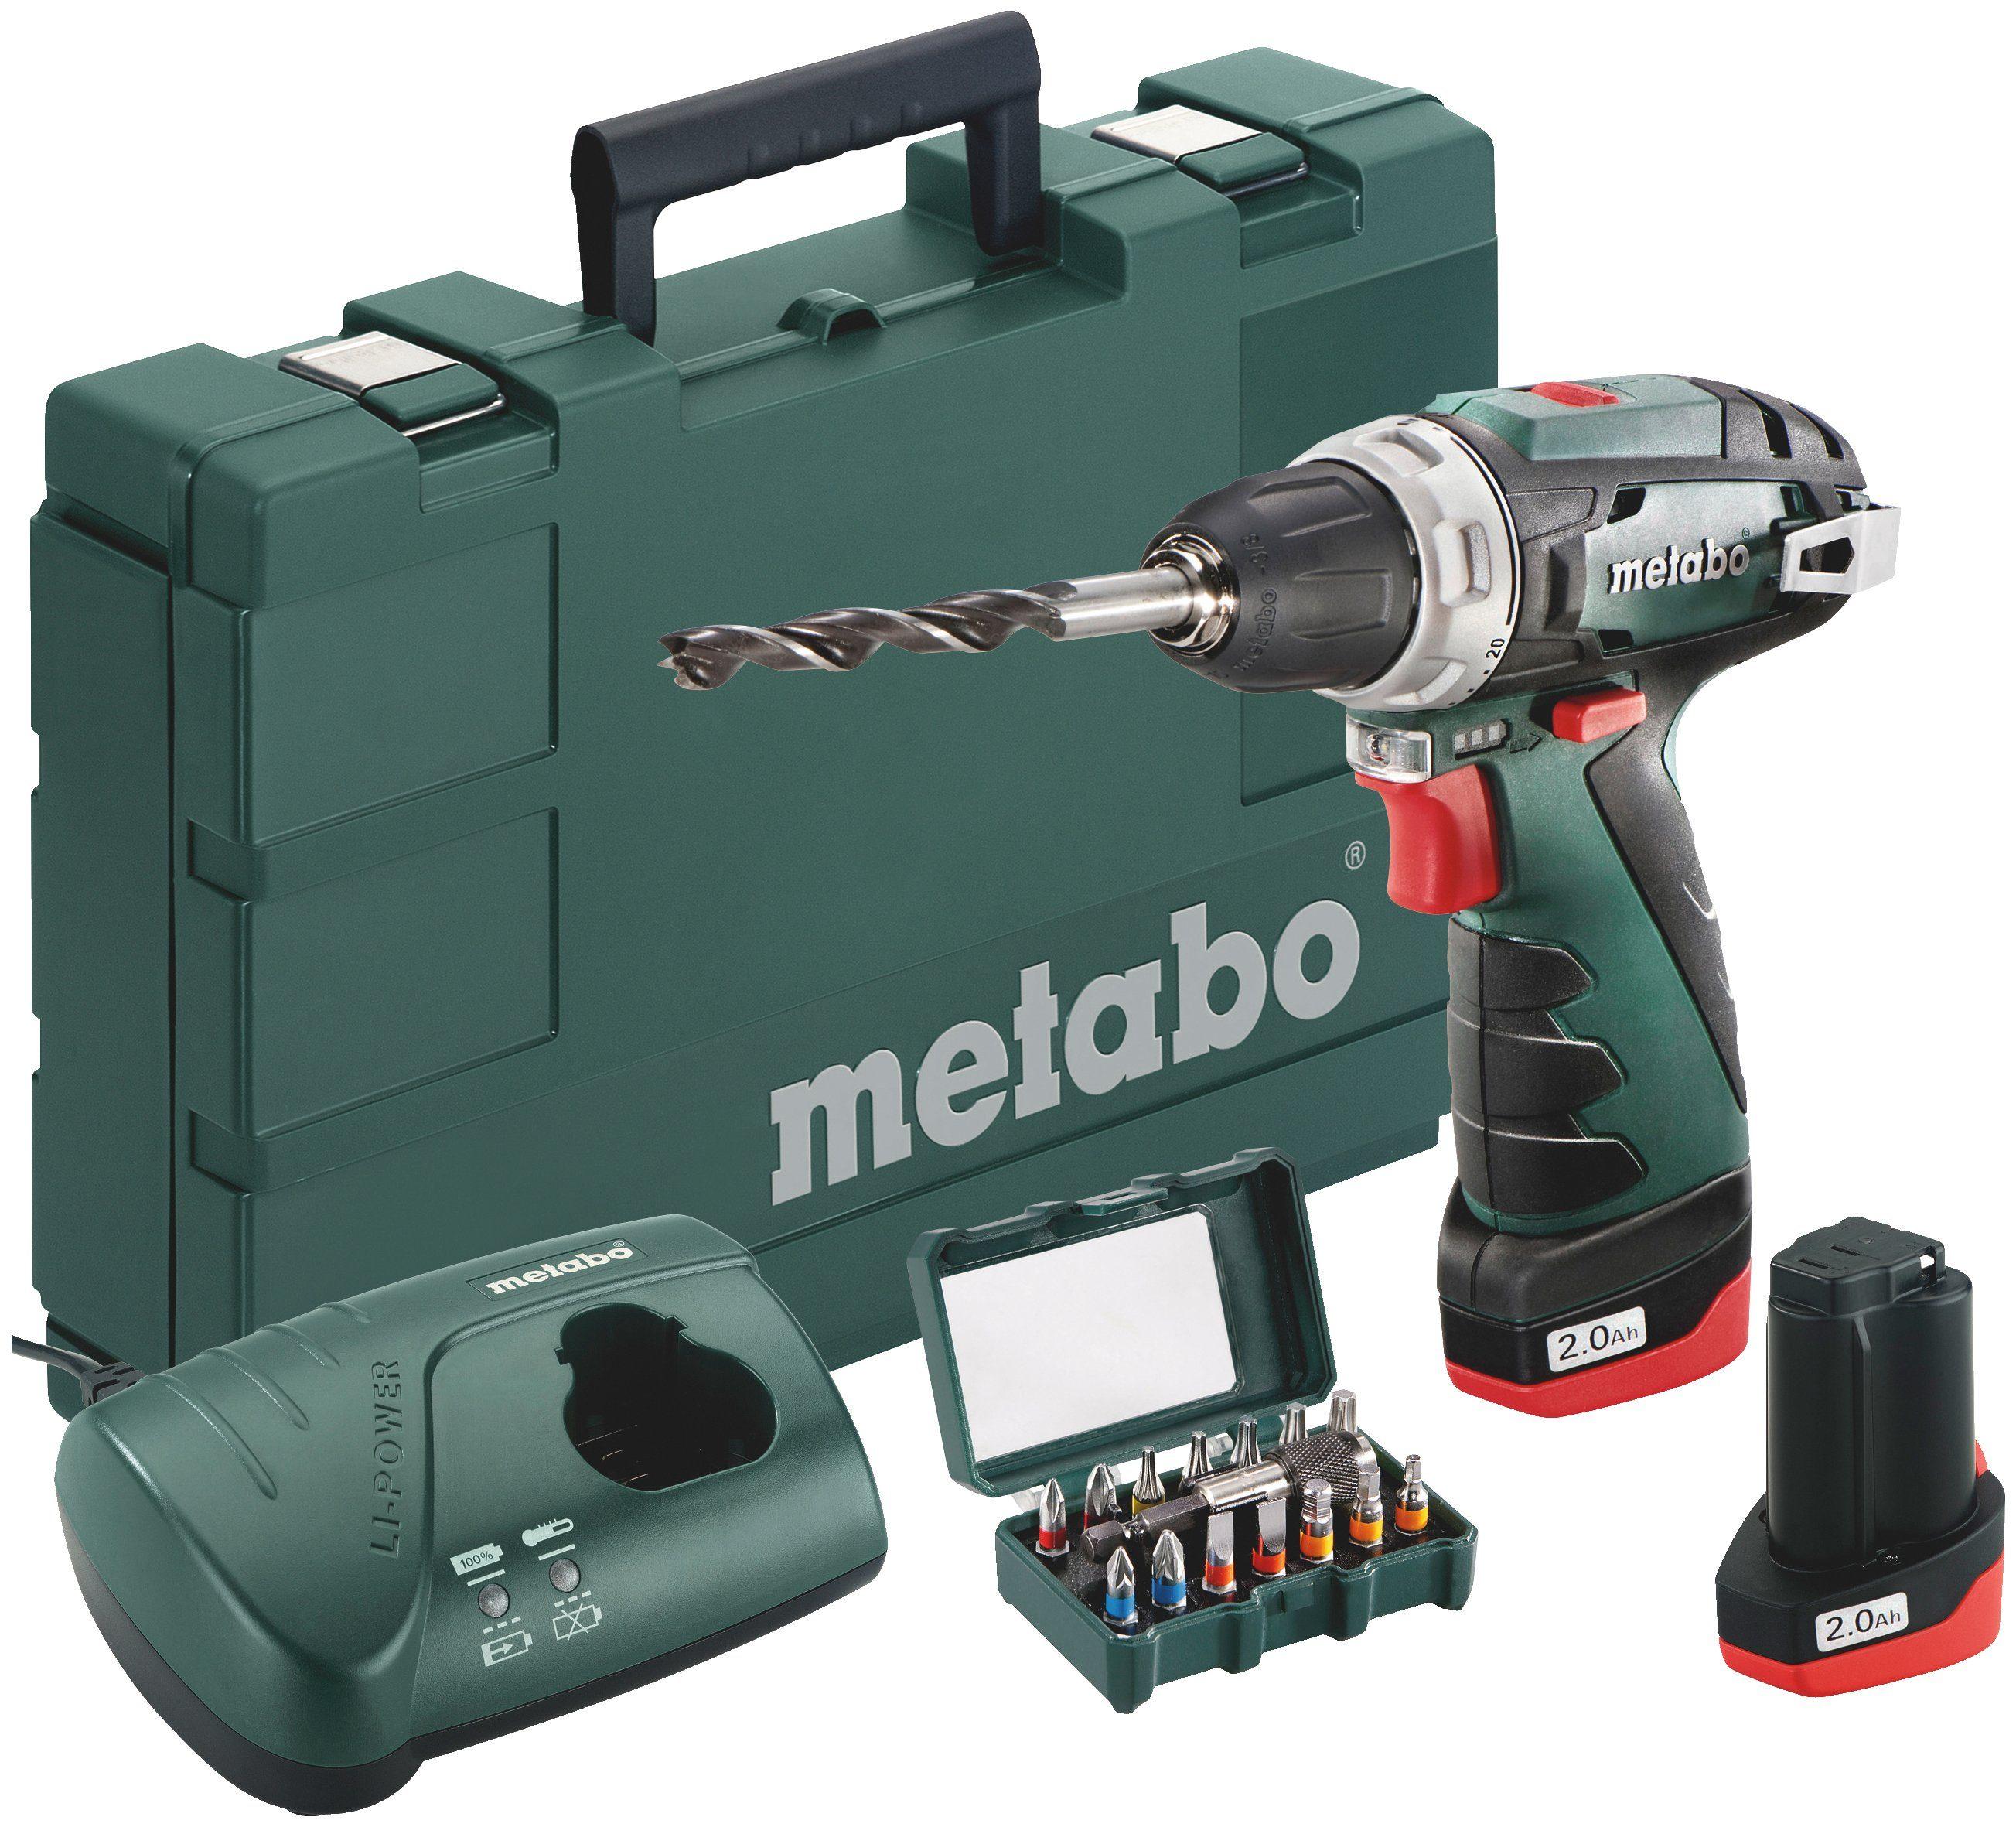 METABO Akkuschrauber »PowerMaxx BS «, 15tlg.Box, mit Akku, Ladegerät und Koffer